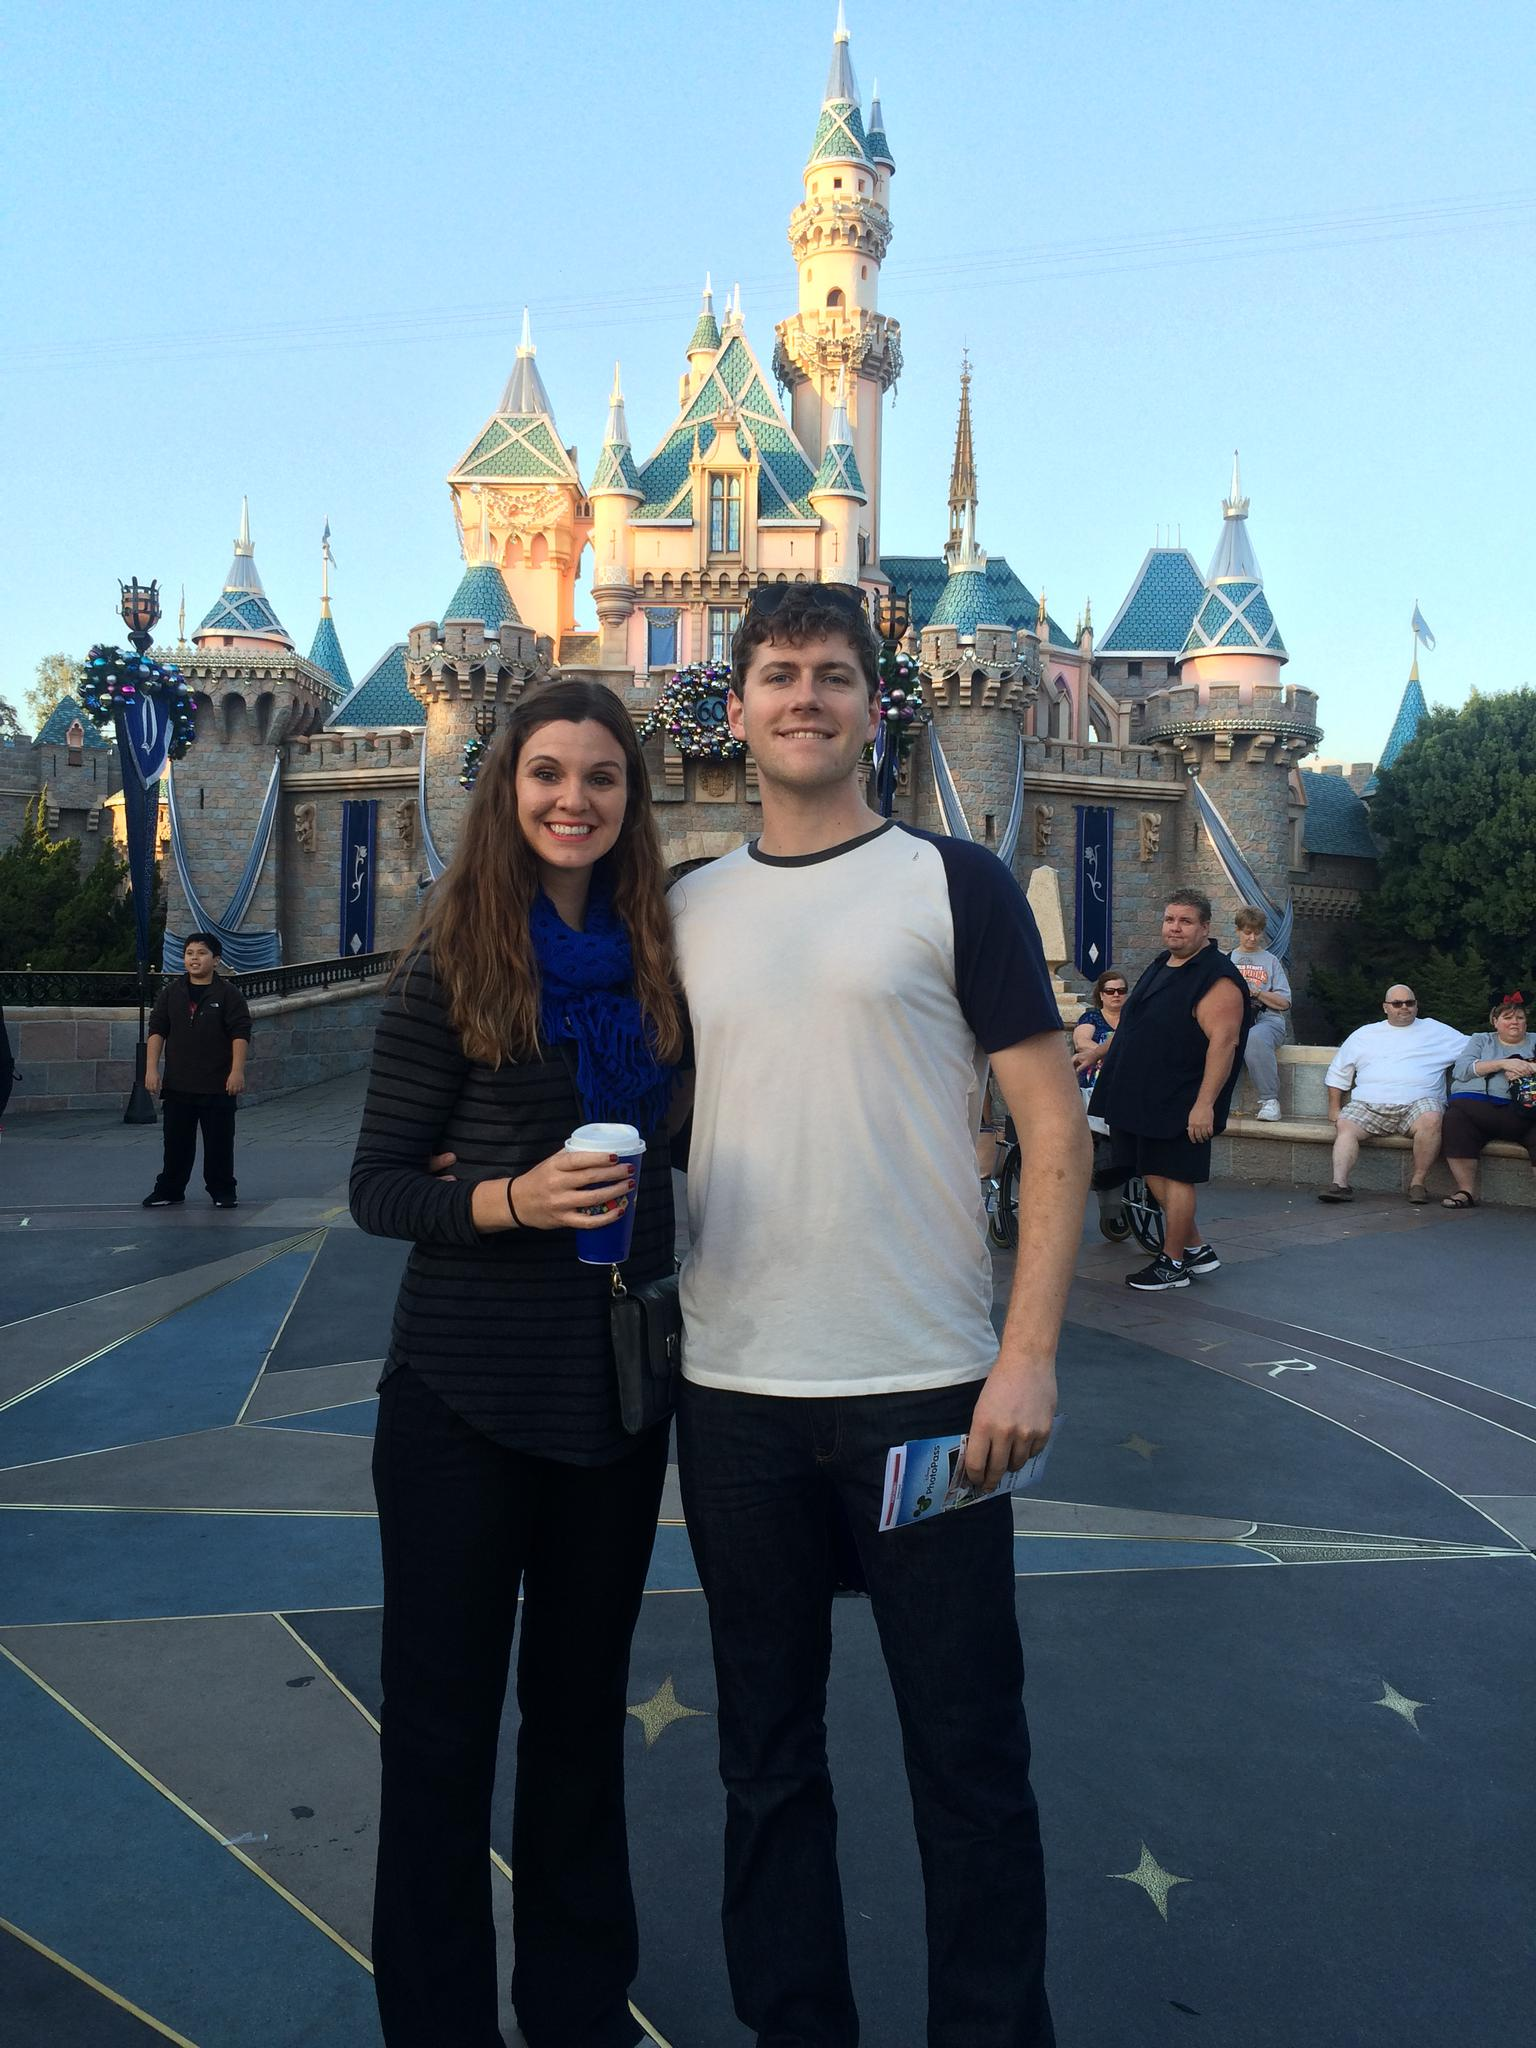 Disneyland, December 2015